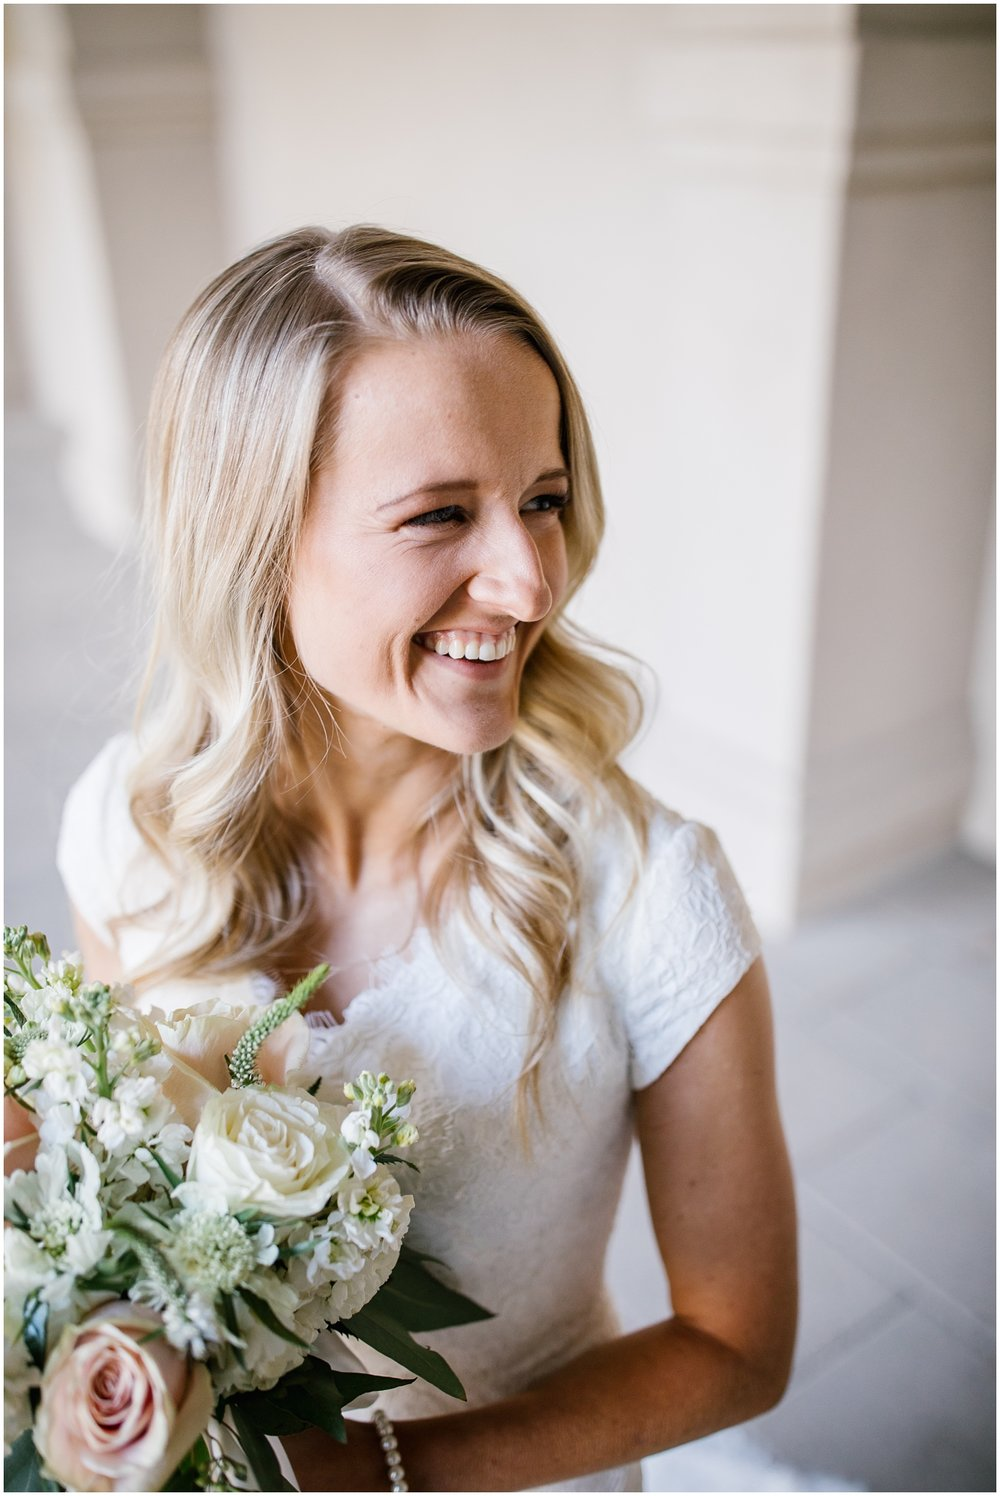 TA-Bridals-30_Lizzie-B-Imagery-Utah-Wedding-Photographer-Park-City-Salt-Lake-City-Thanksgiving-Point-Ashton-Gardens-Lehi-Utah.jpg